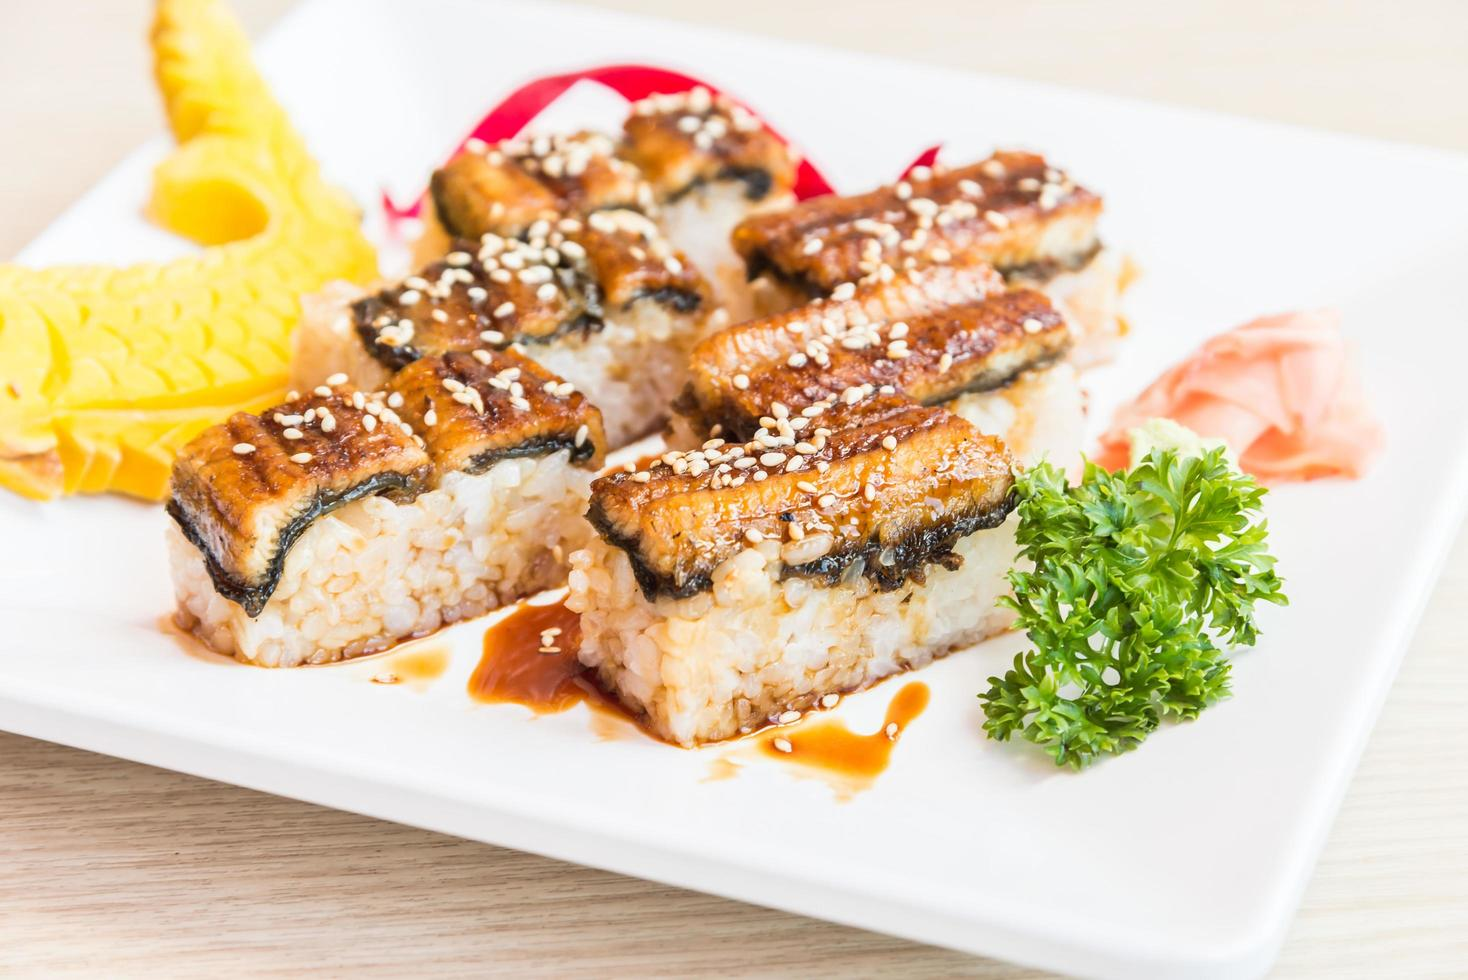 ål sushi rulle maki foto